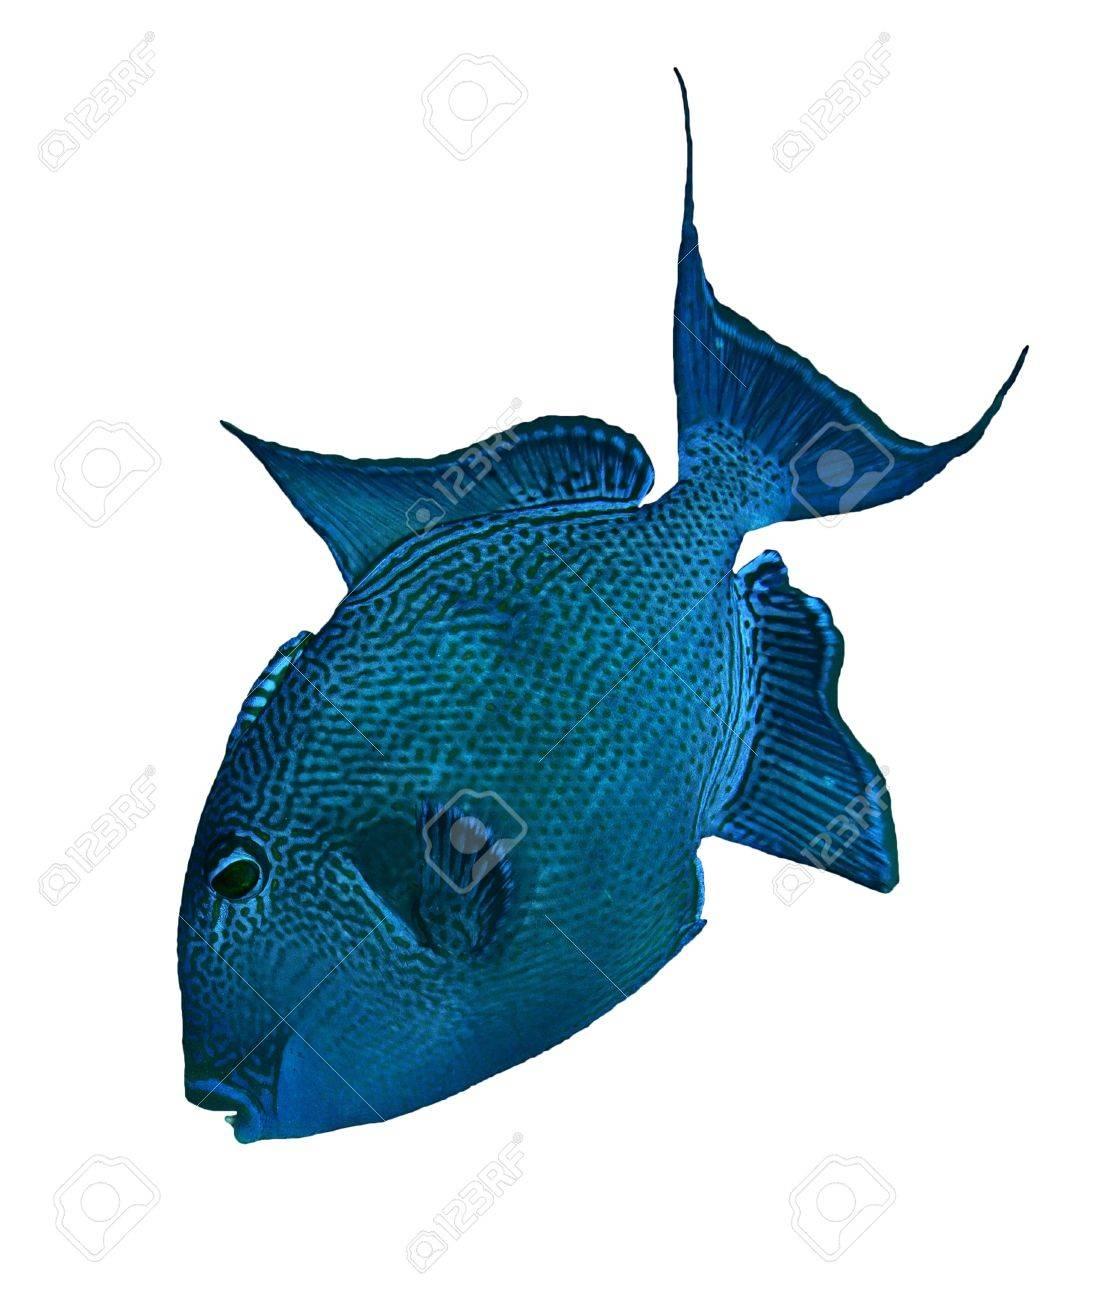 Blue triggerfish  Pseudobalistes fuscus  isolated on white background Stock Photo - 20276512